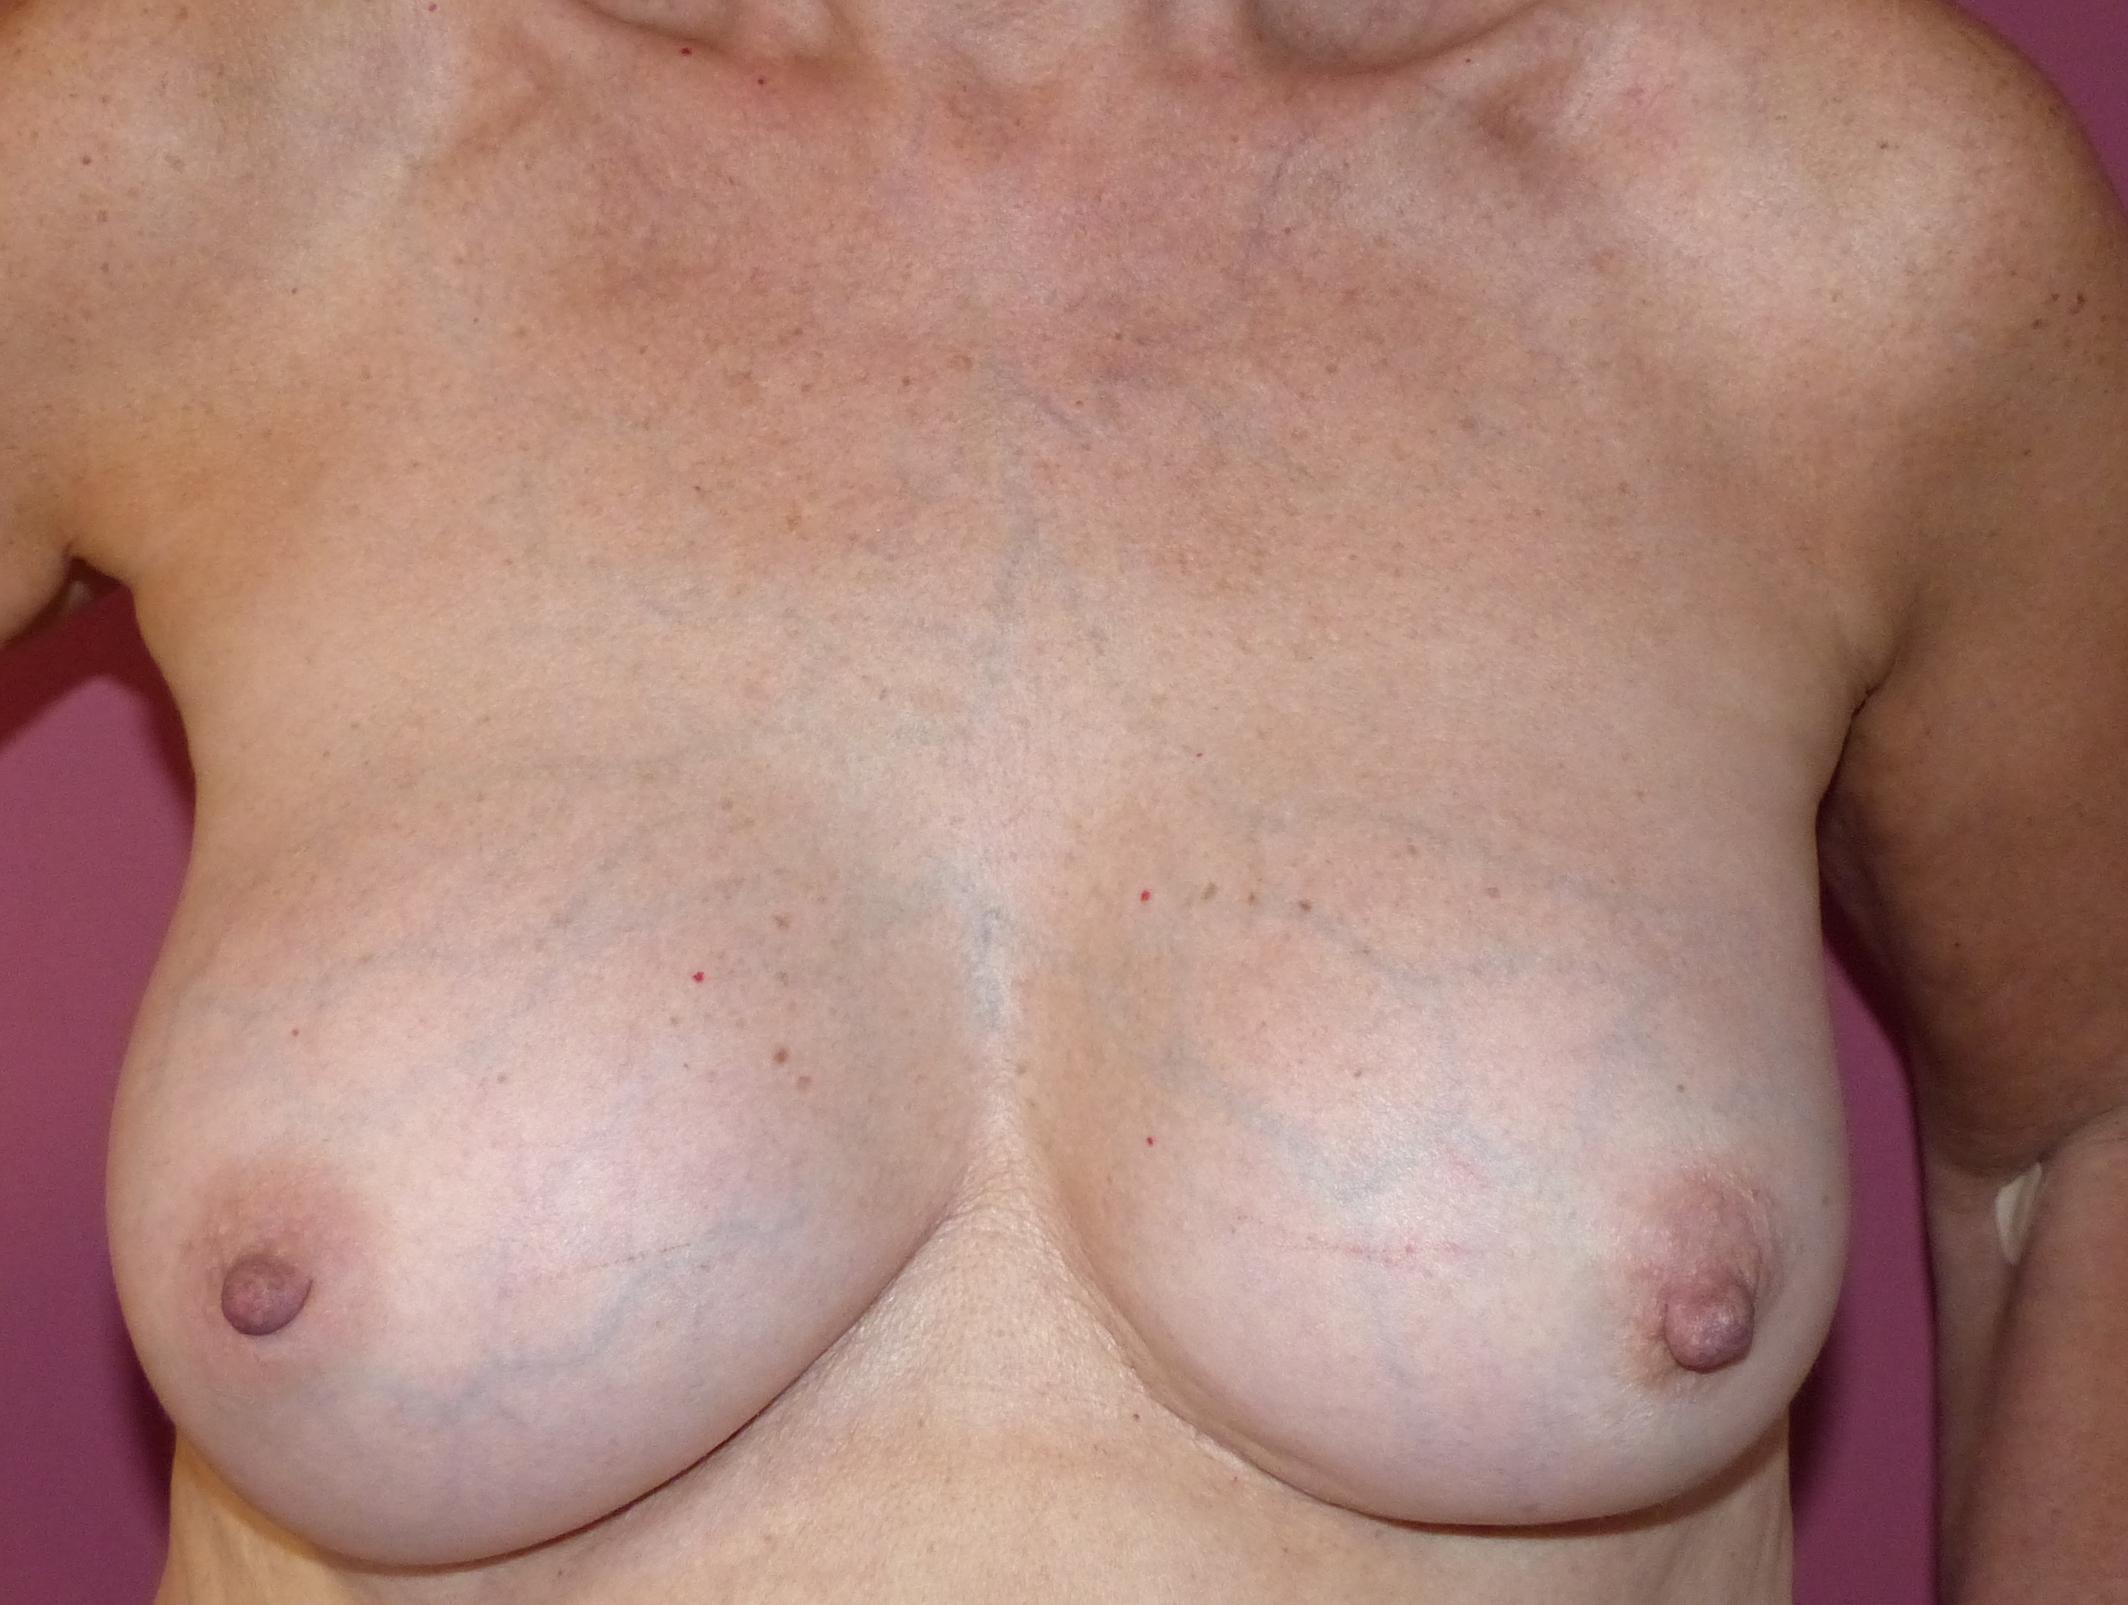 old breast implants harley